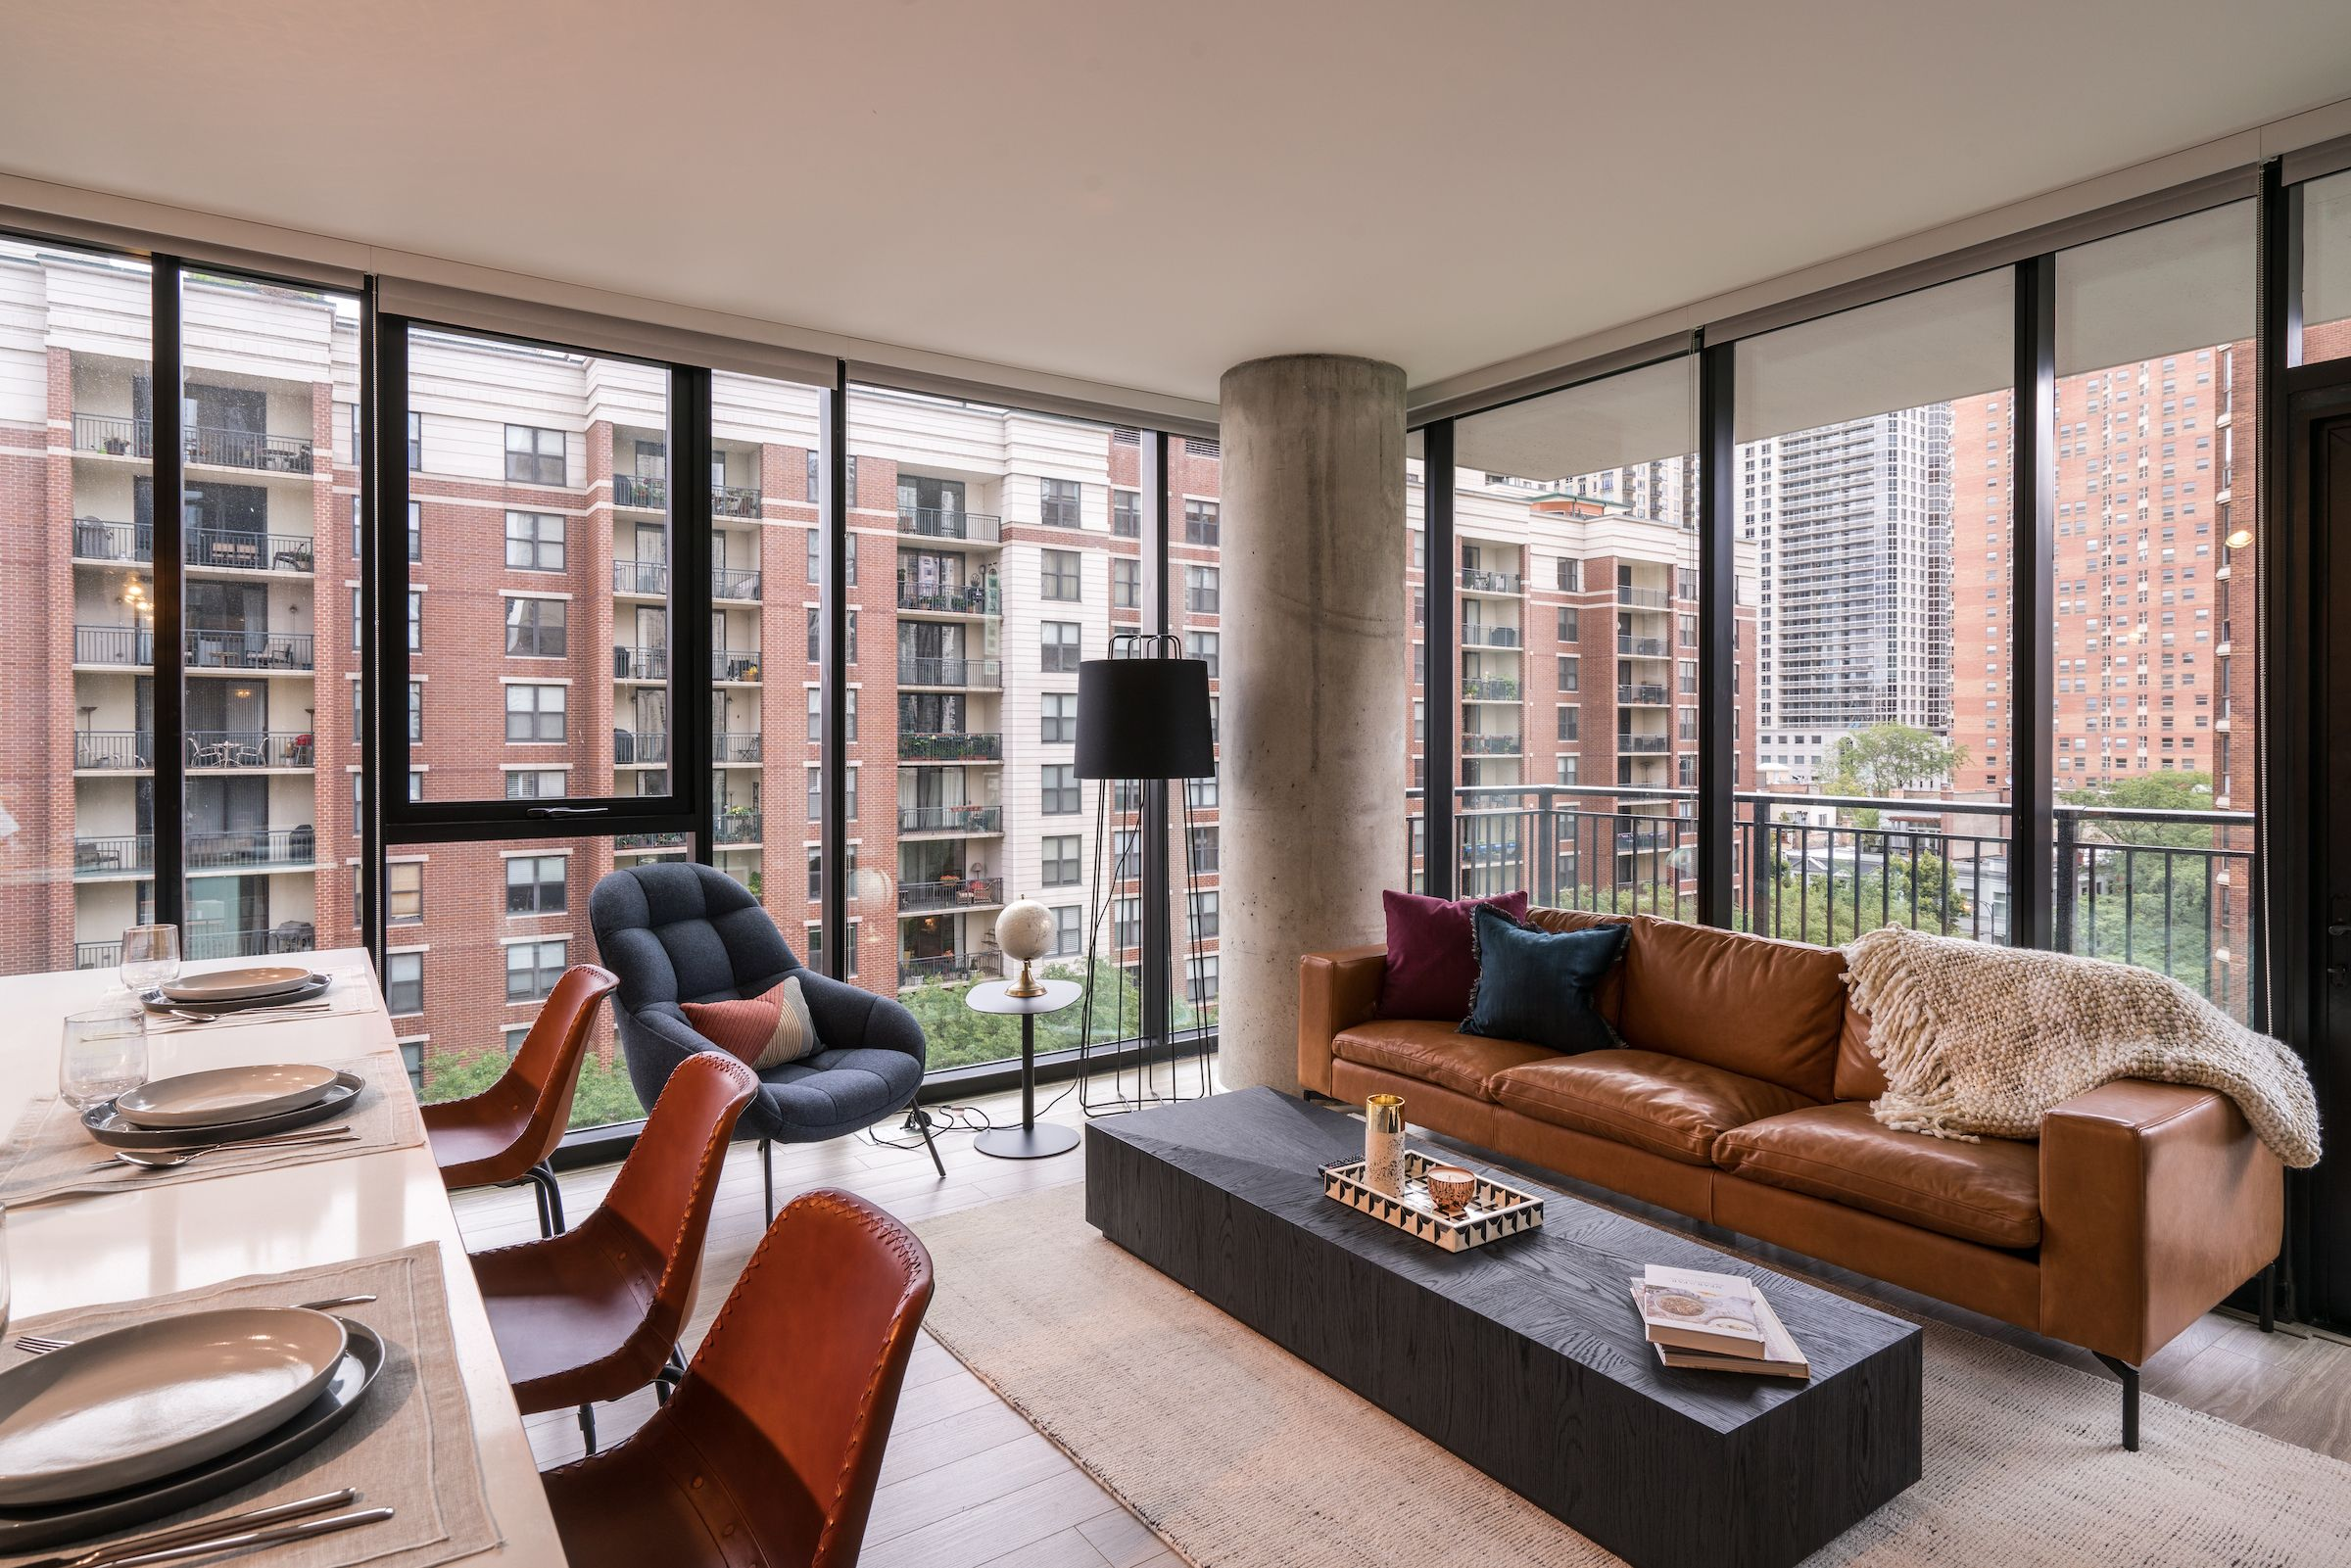 Inside Chicago's new Aurélien apartments (With images